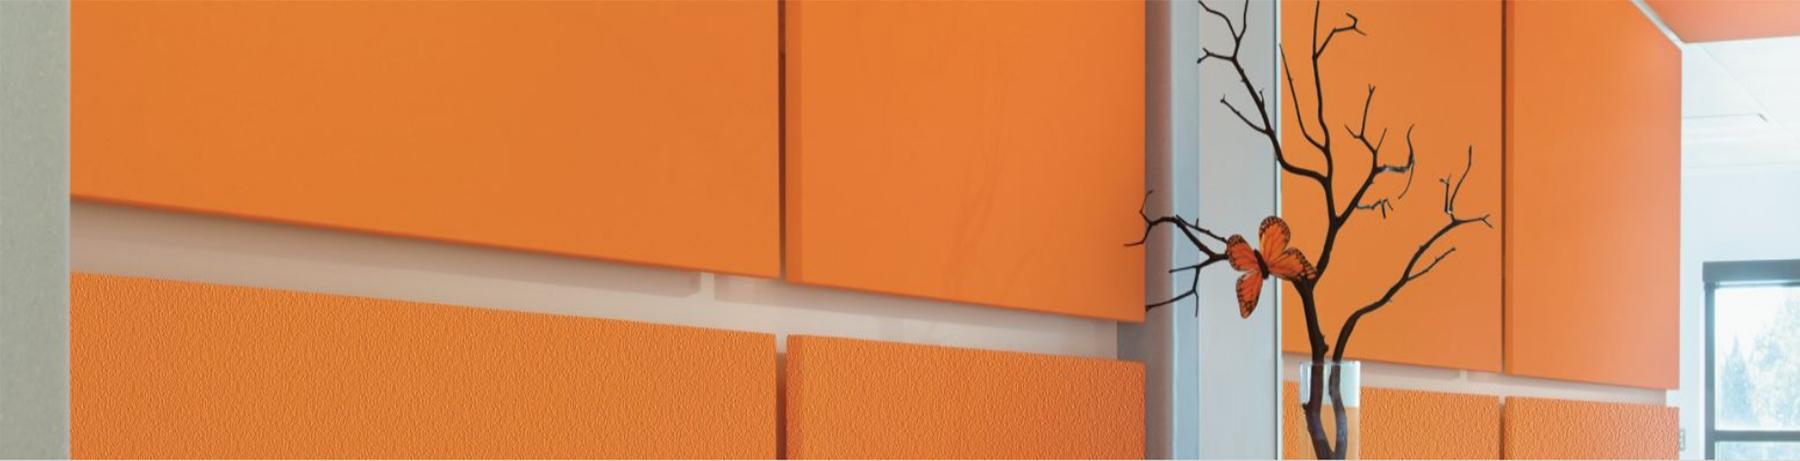 Acoustical Walls - Fiberglass Acoustical Wall Panels